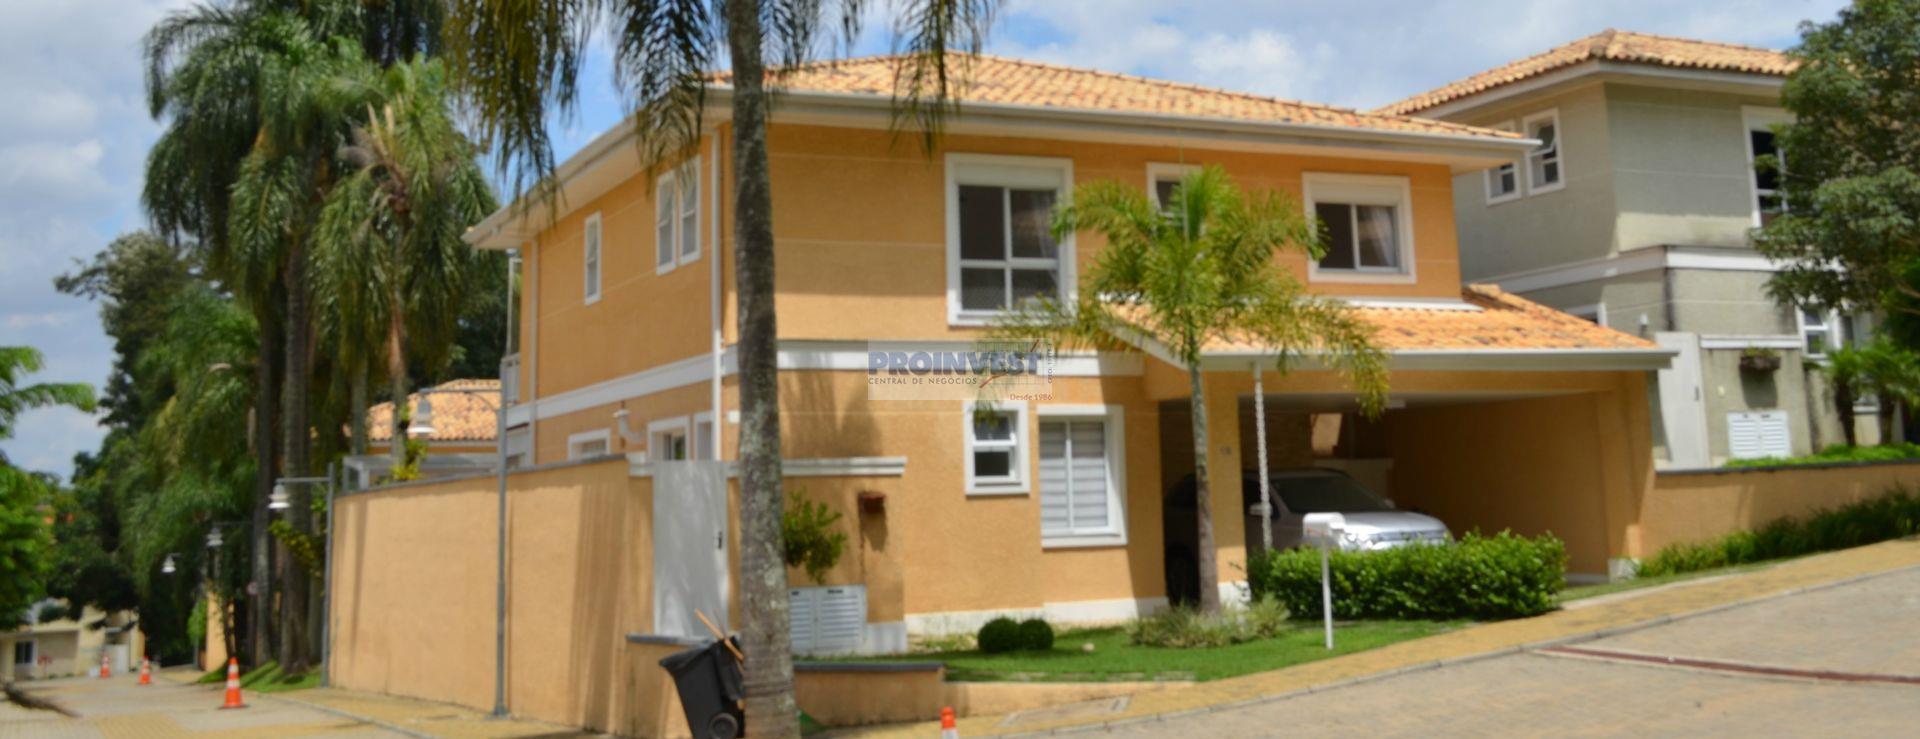 Casa residencial à venda, Raízes Granja Viana, Cotia.